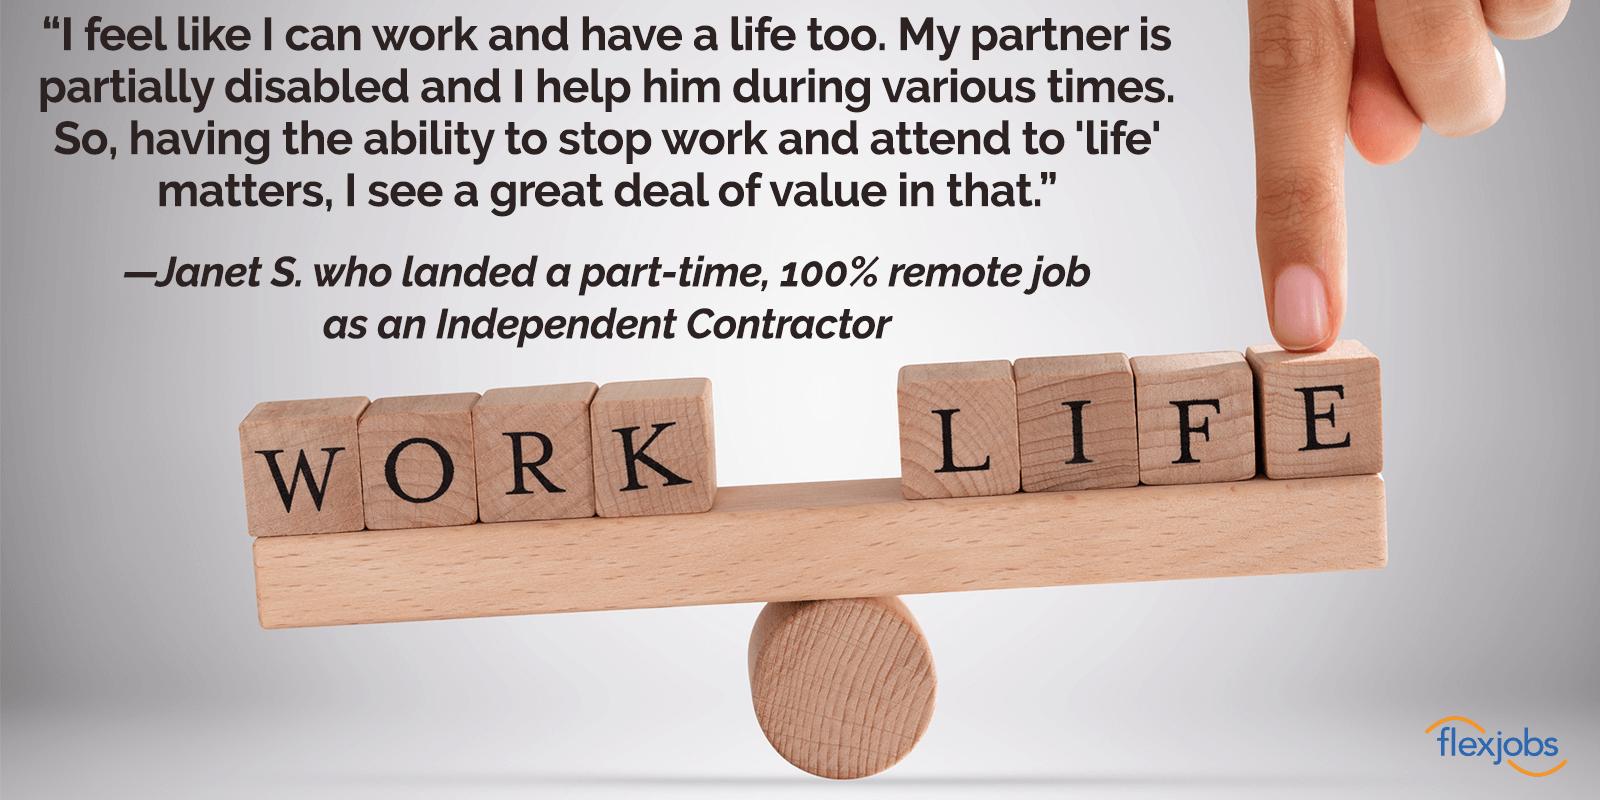 FlexJobs Helps Freelancer Grow Career, Find Jobs That Work Around Life 2